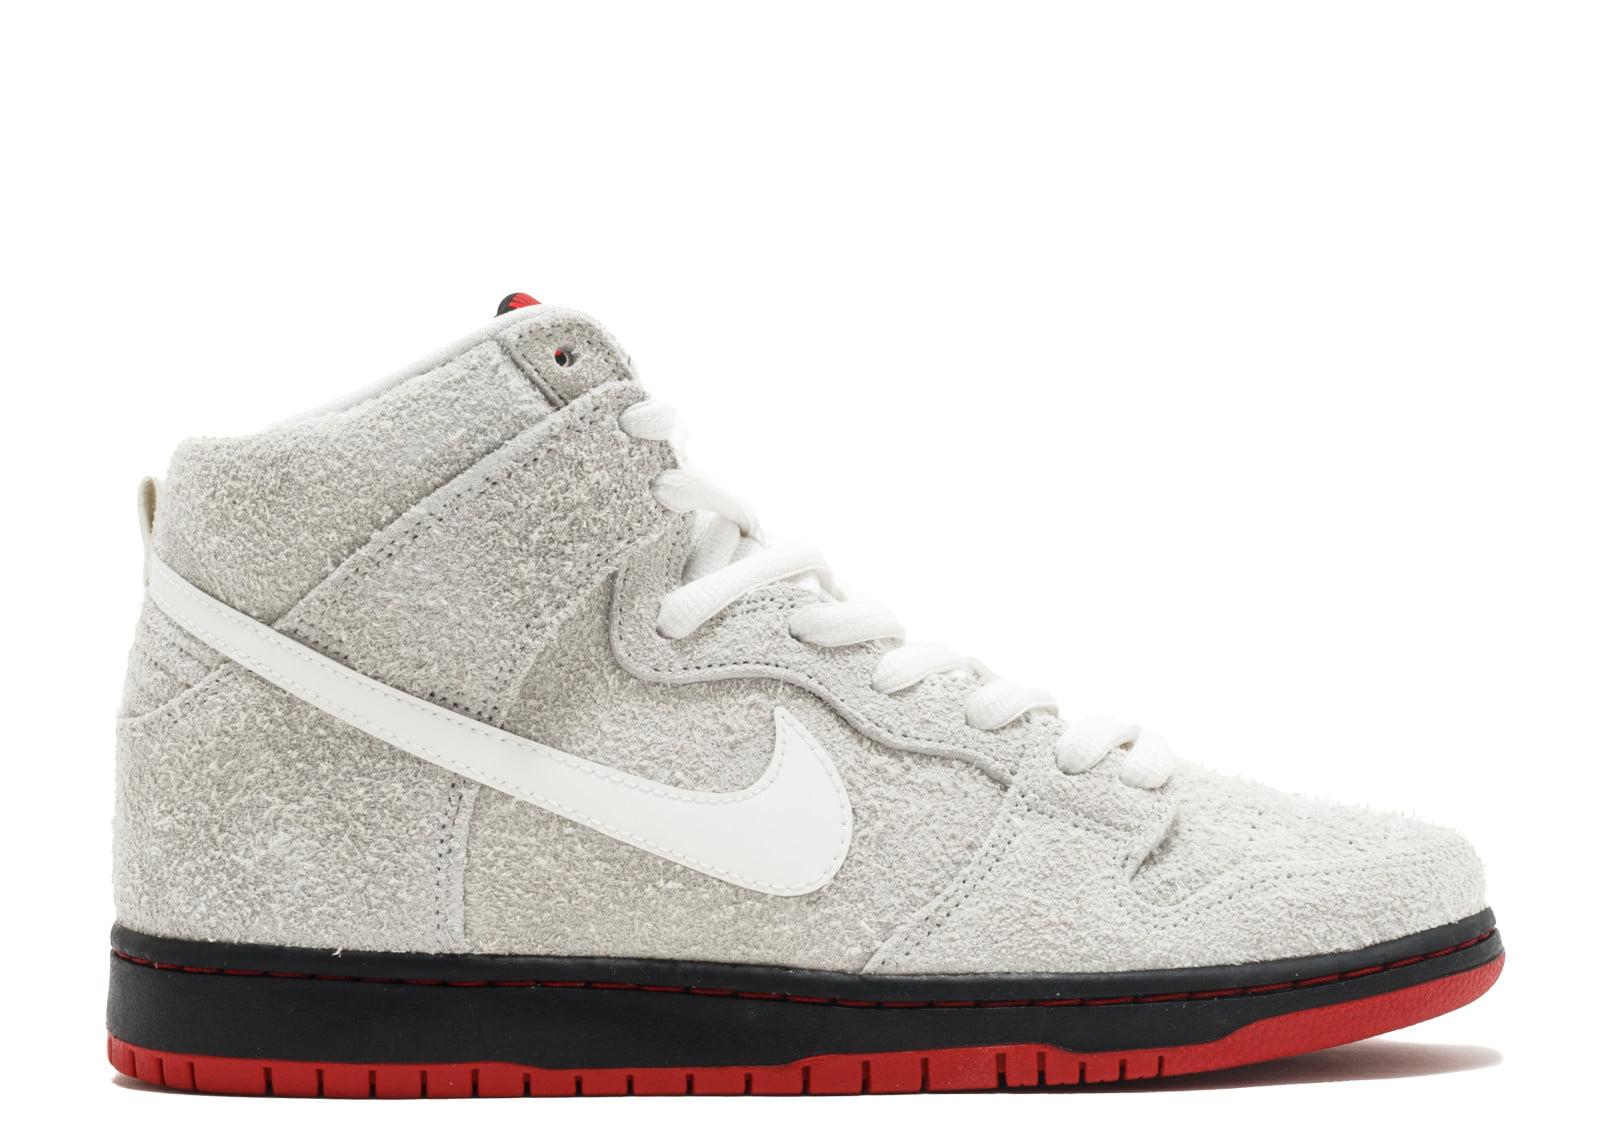 best loved 1e44f b0619 Nike - Men - Sb Dunk High Trd Qs  Black Sheep  - 881758-110 - Size 7